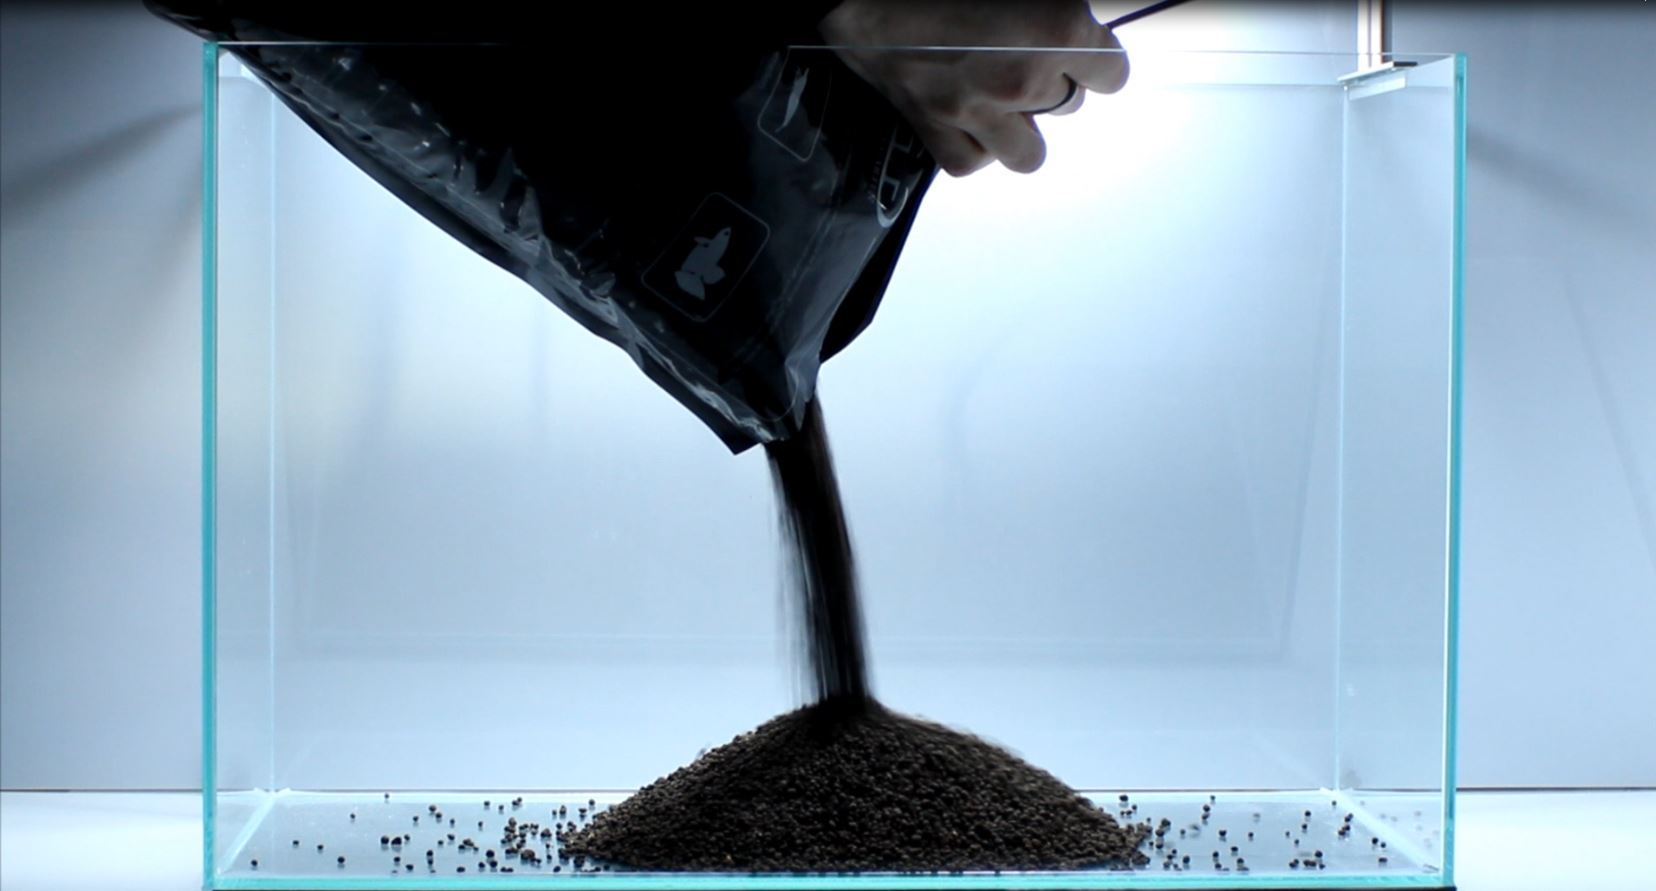 Enviroment Soil als Bodengrund